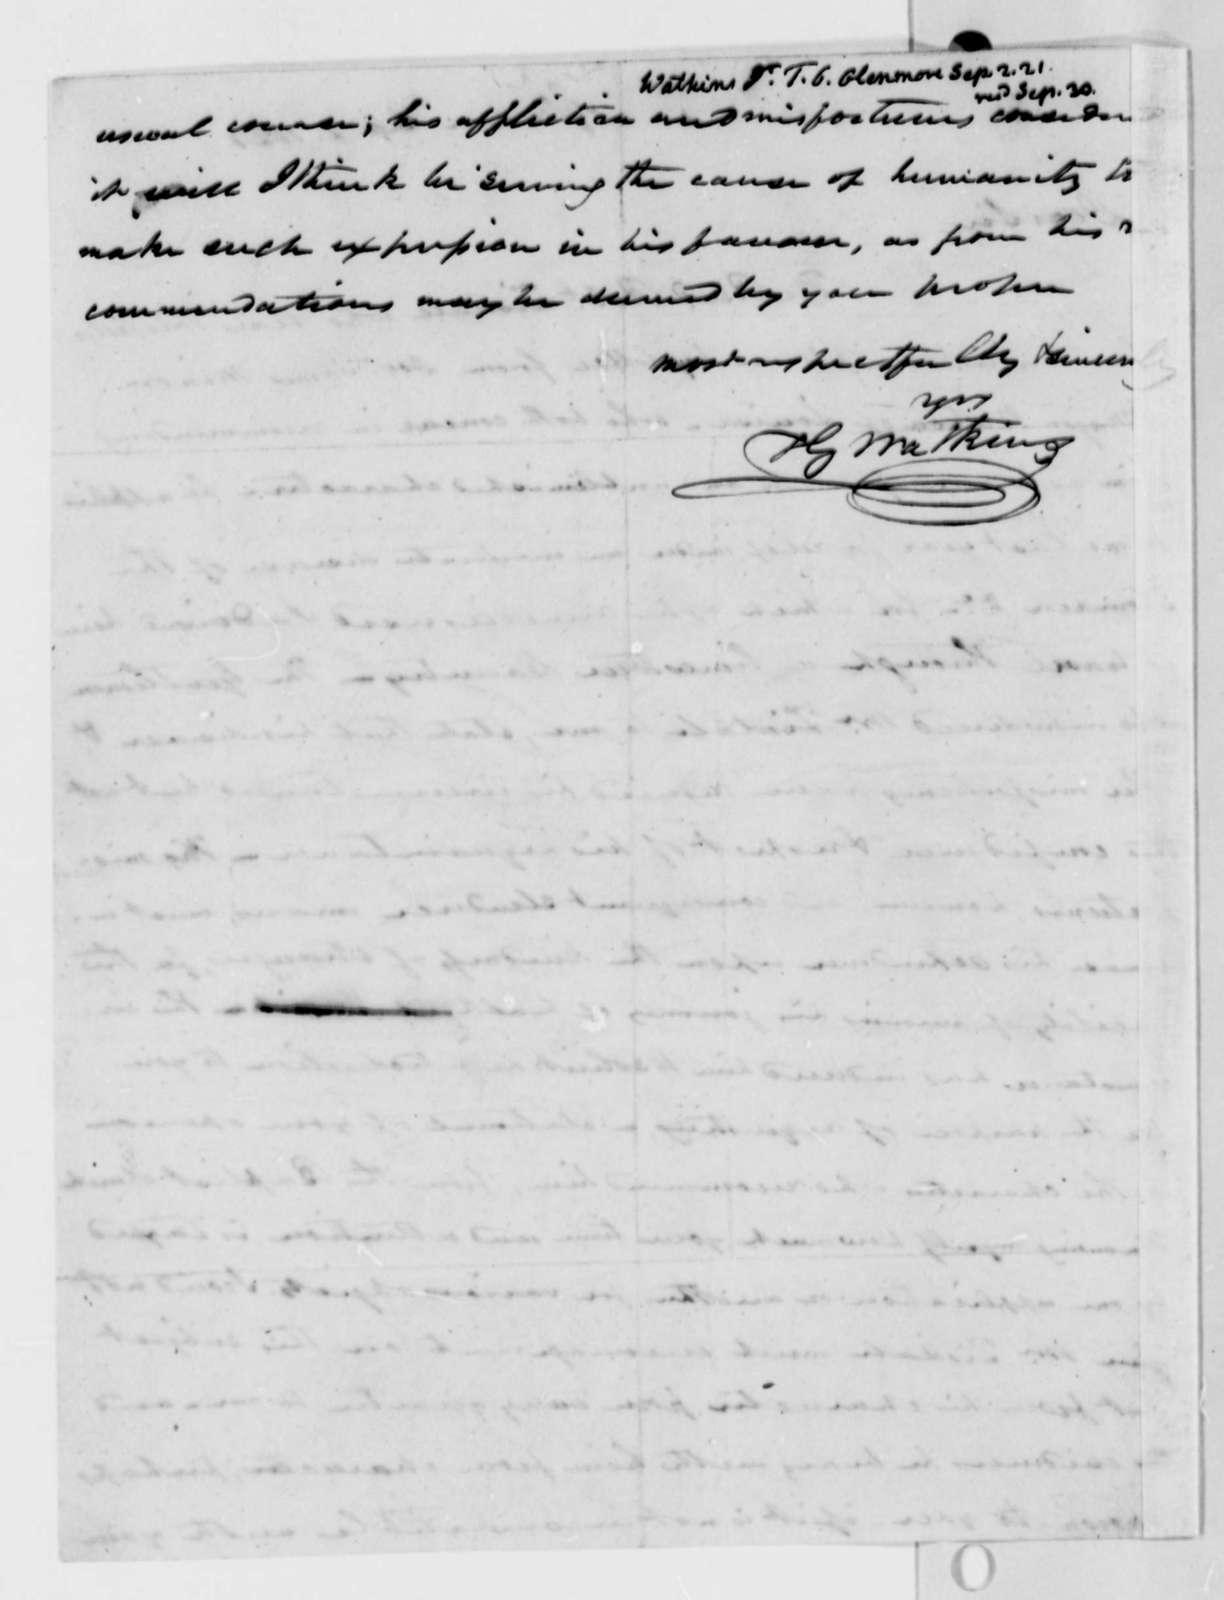 Thomas G. Watkins to Thomas Jefferson, September 2, 1821